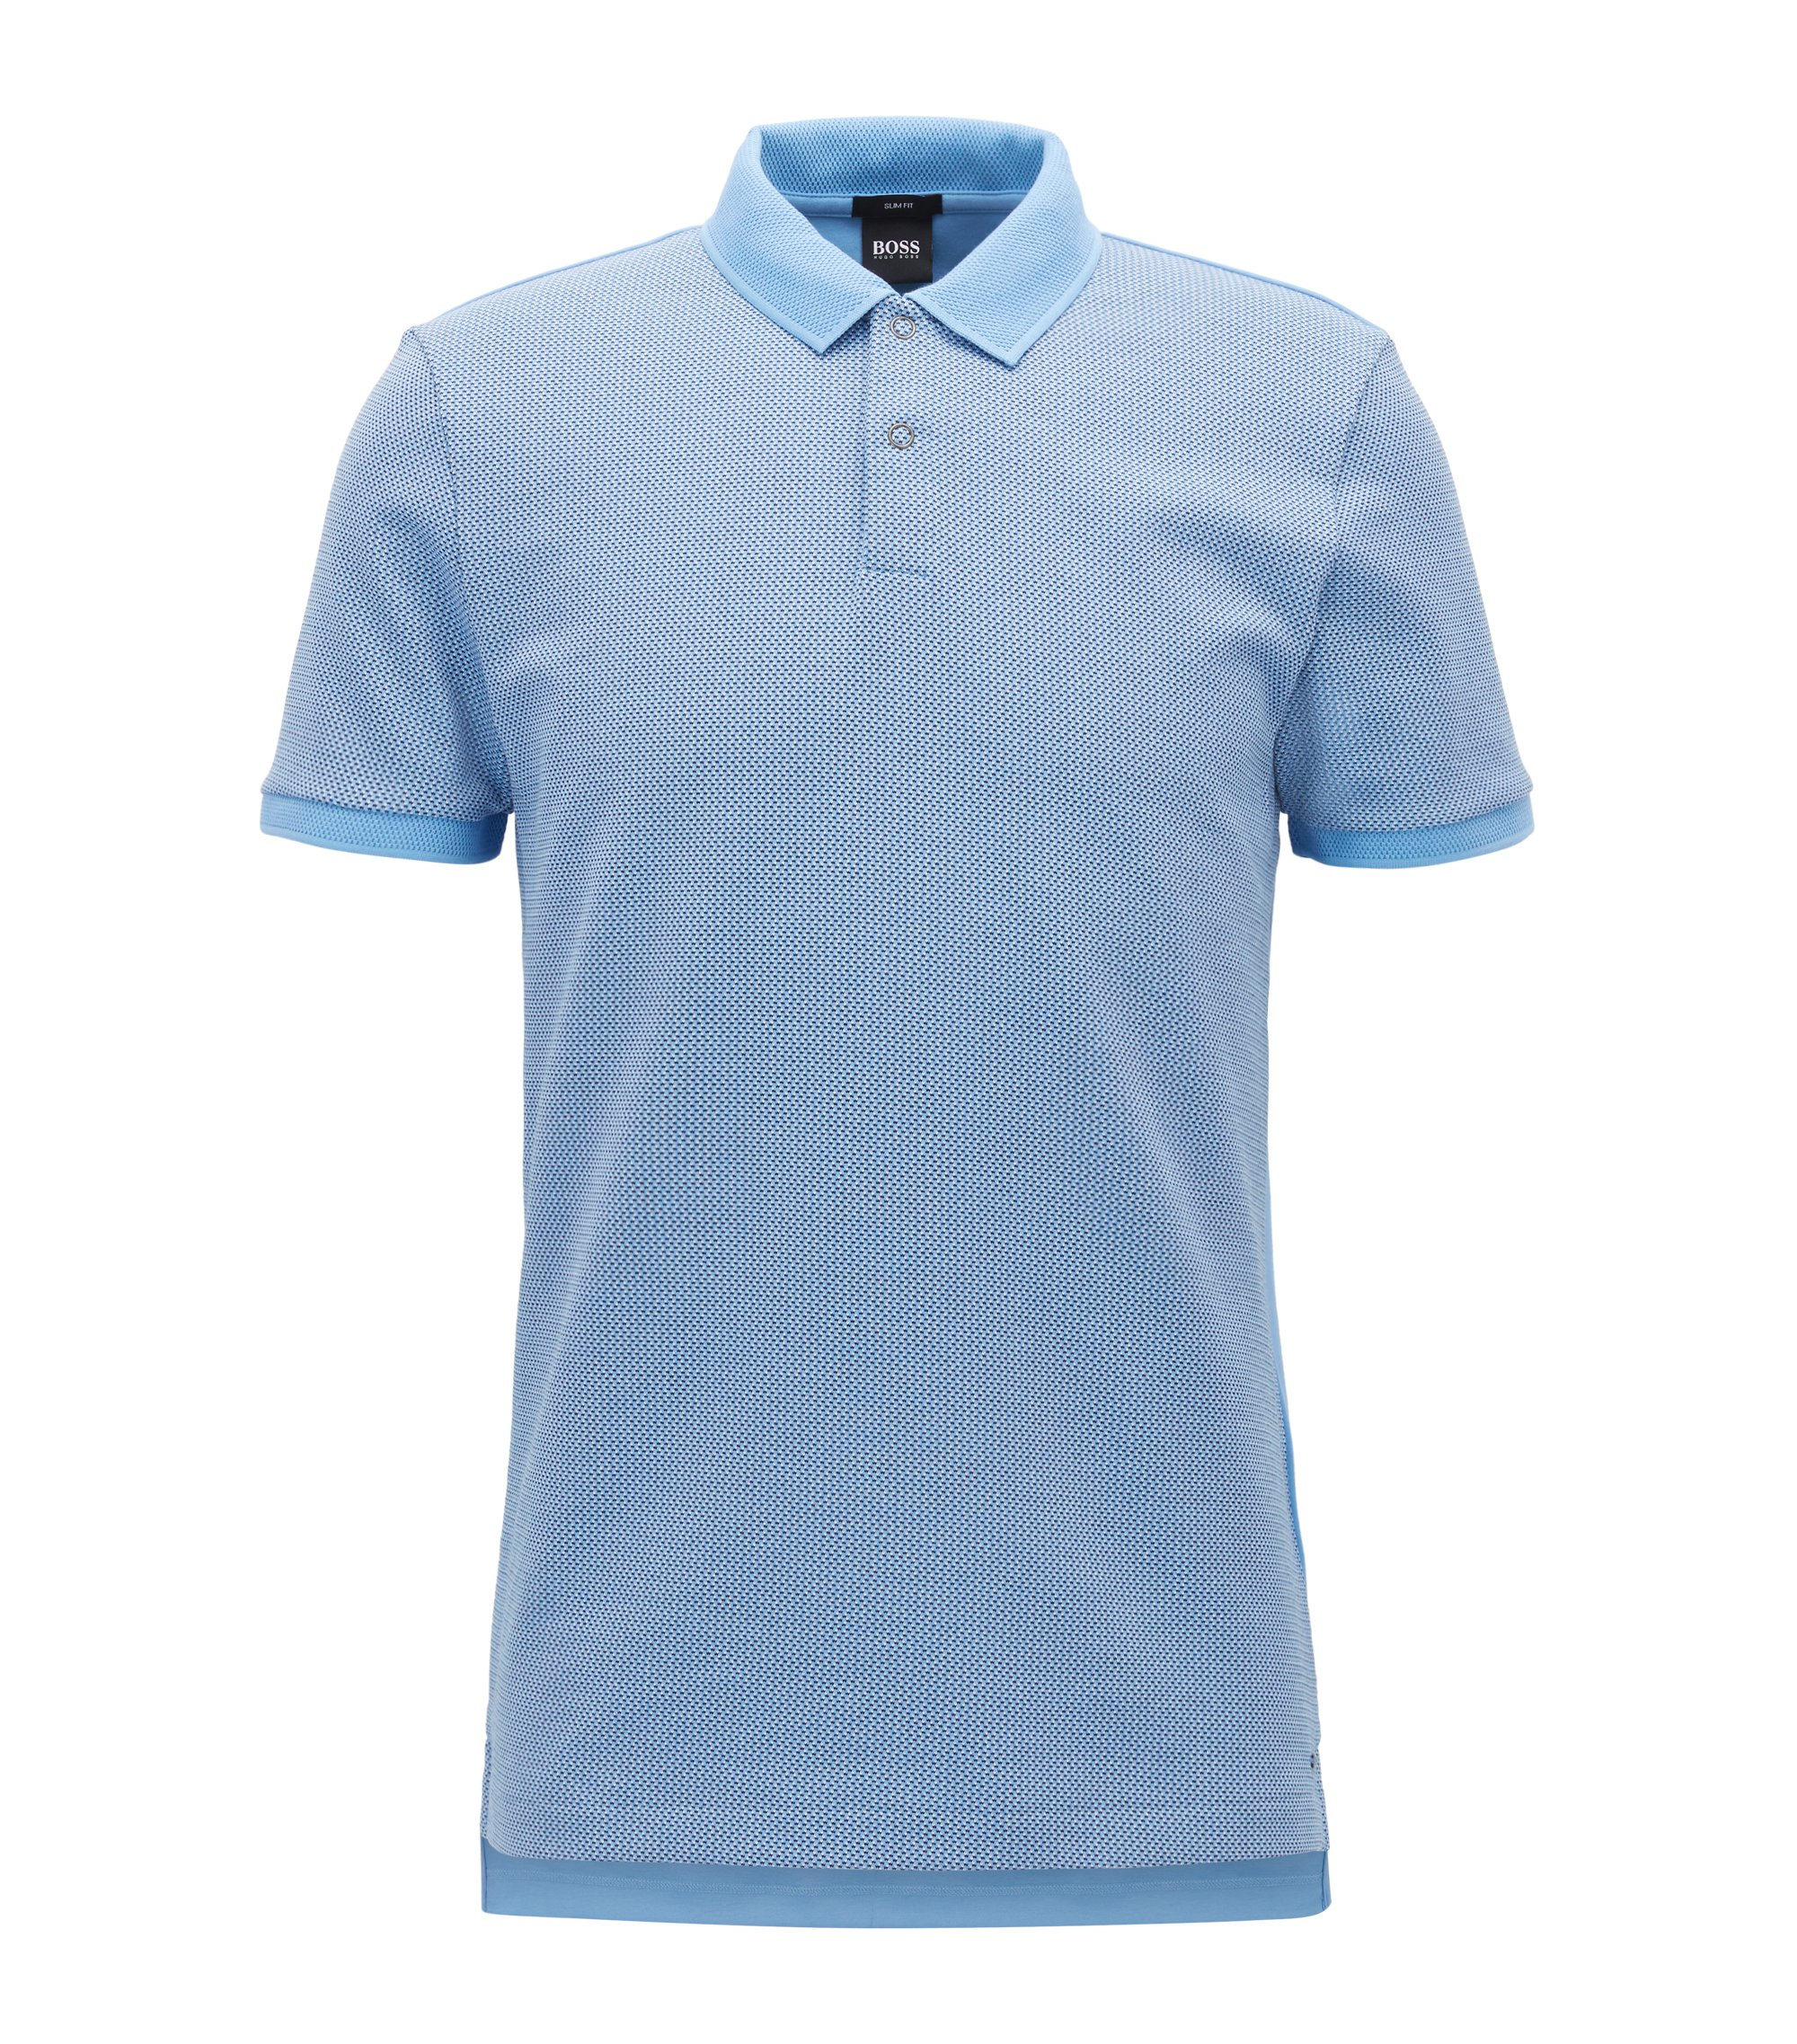 Poloshirt aus Baumwoll-Jacquard mit Birdseye-Muster, Hellblau